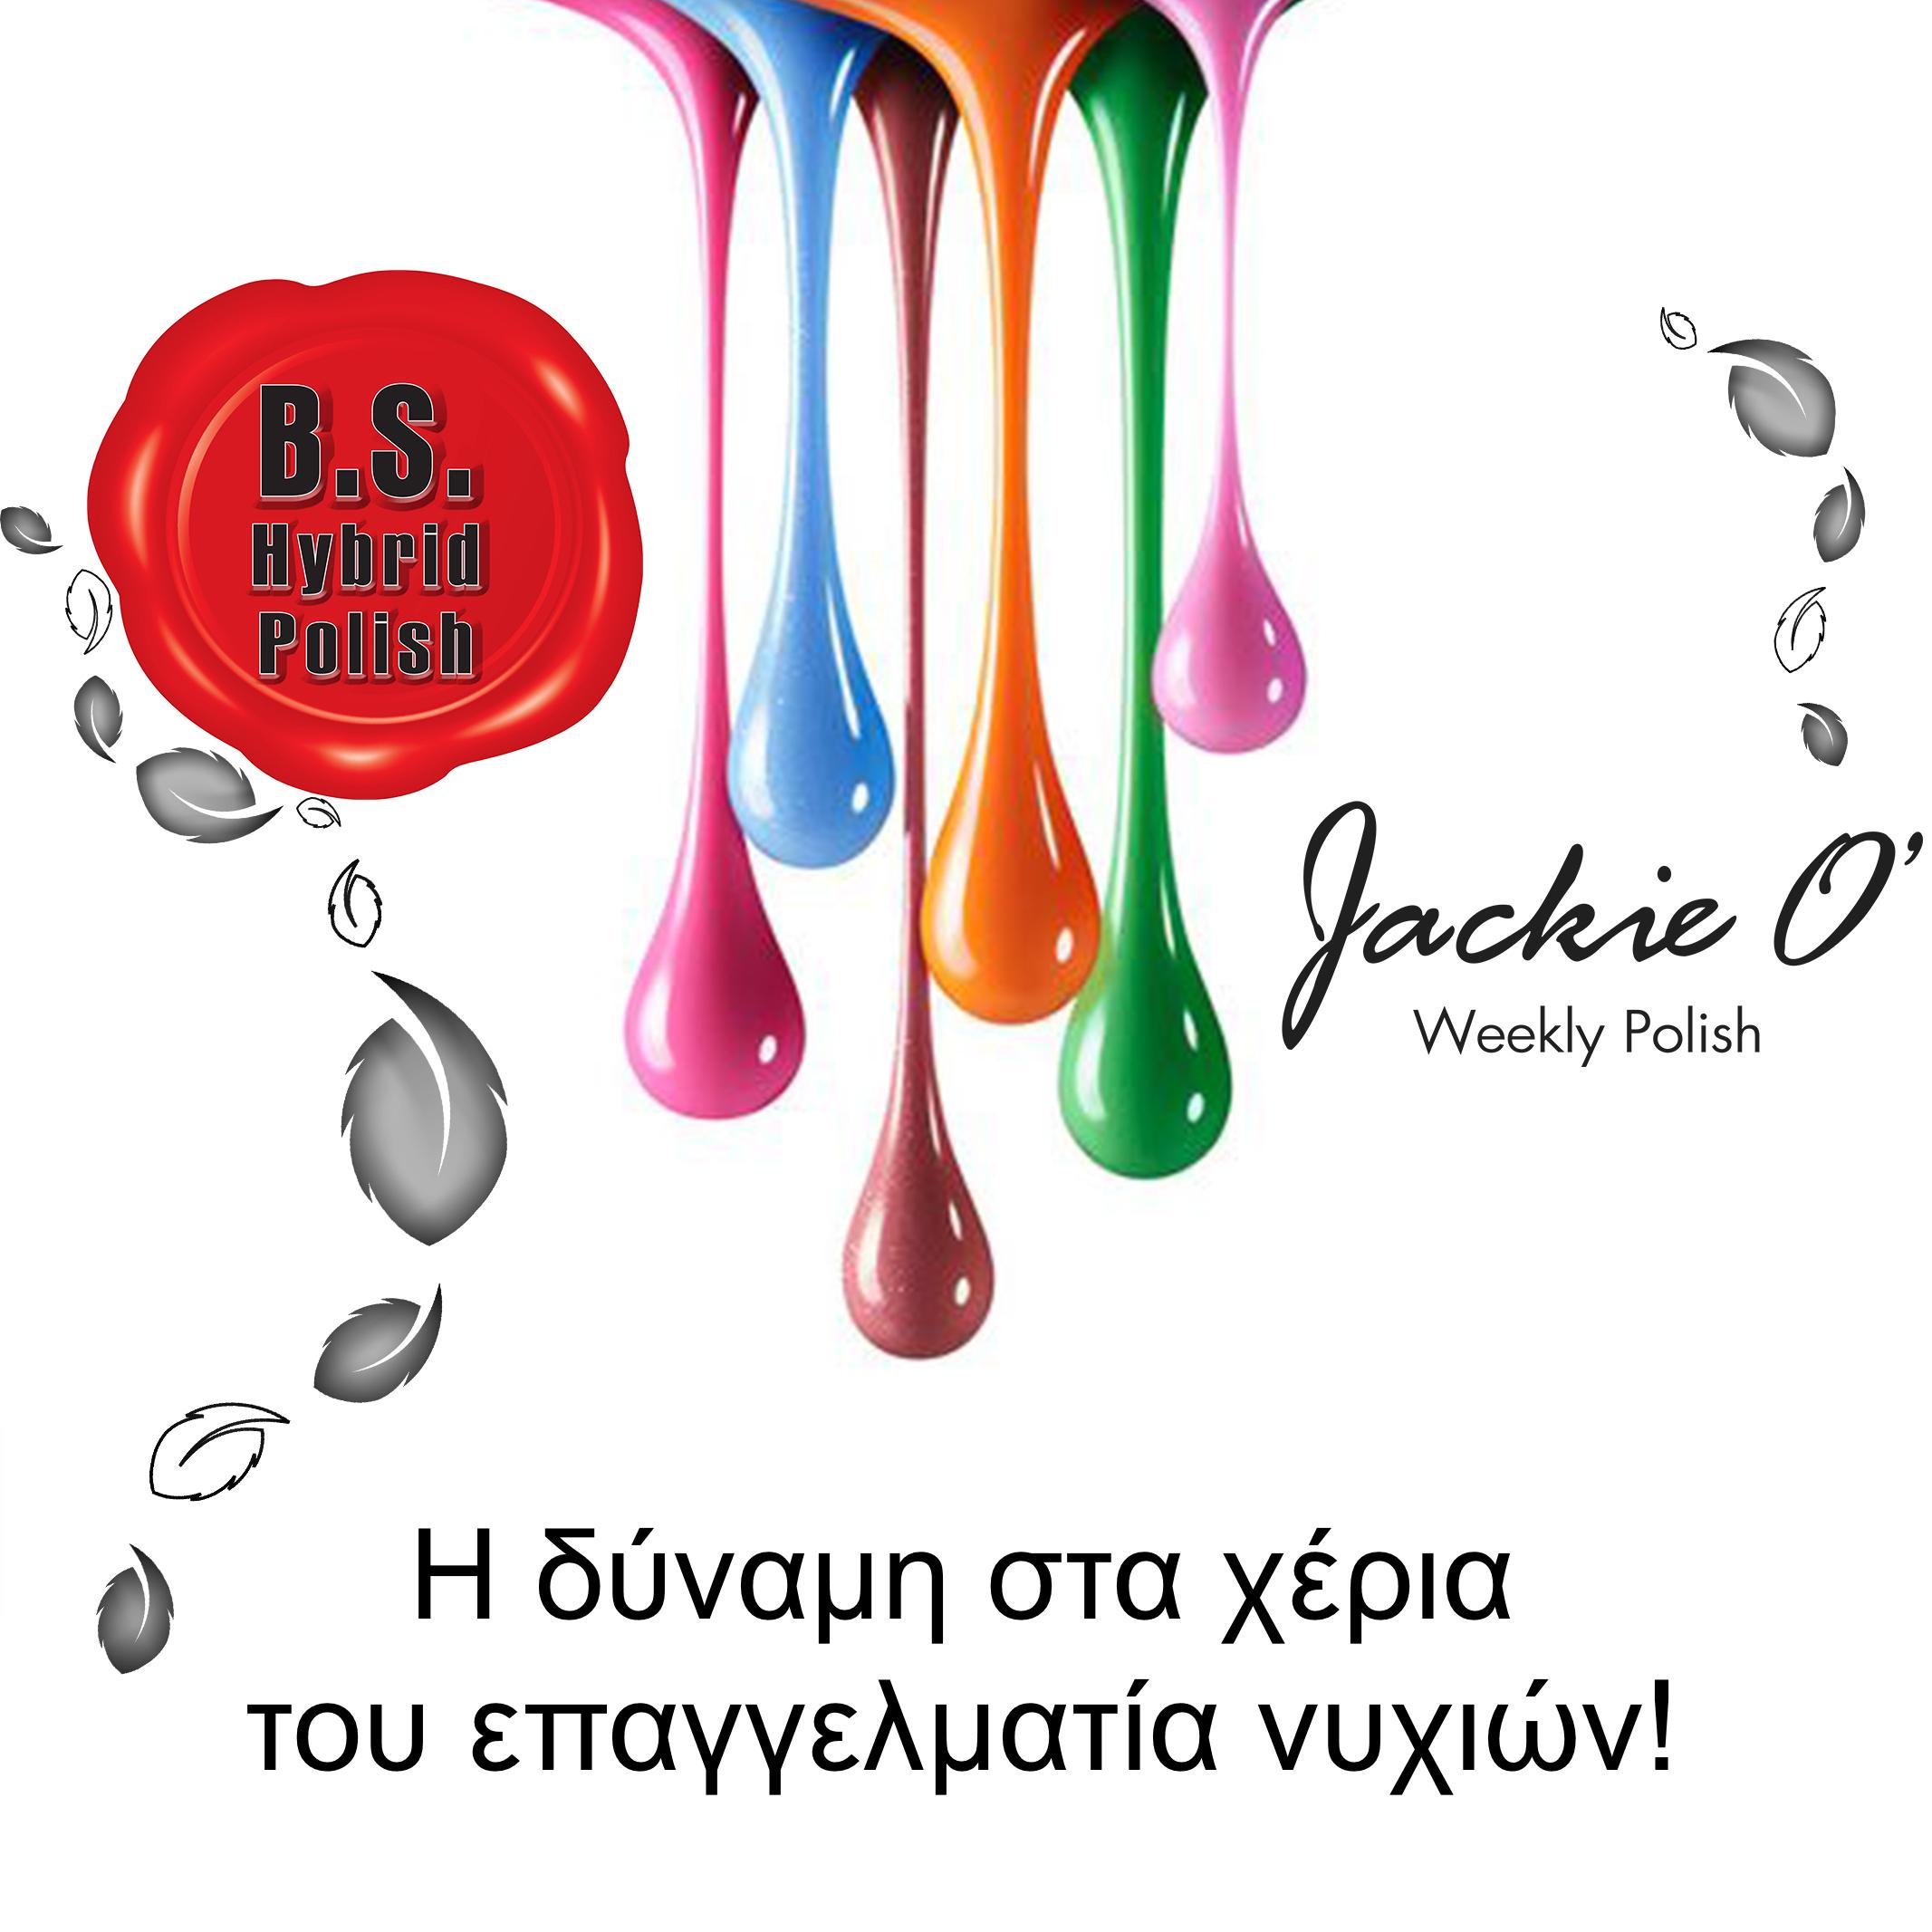 B.S. Hybrid Polish Store